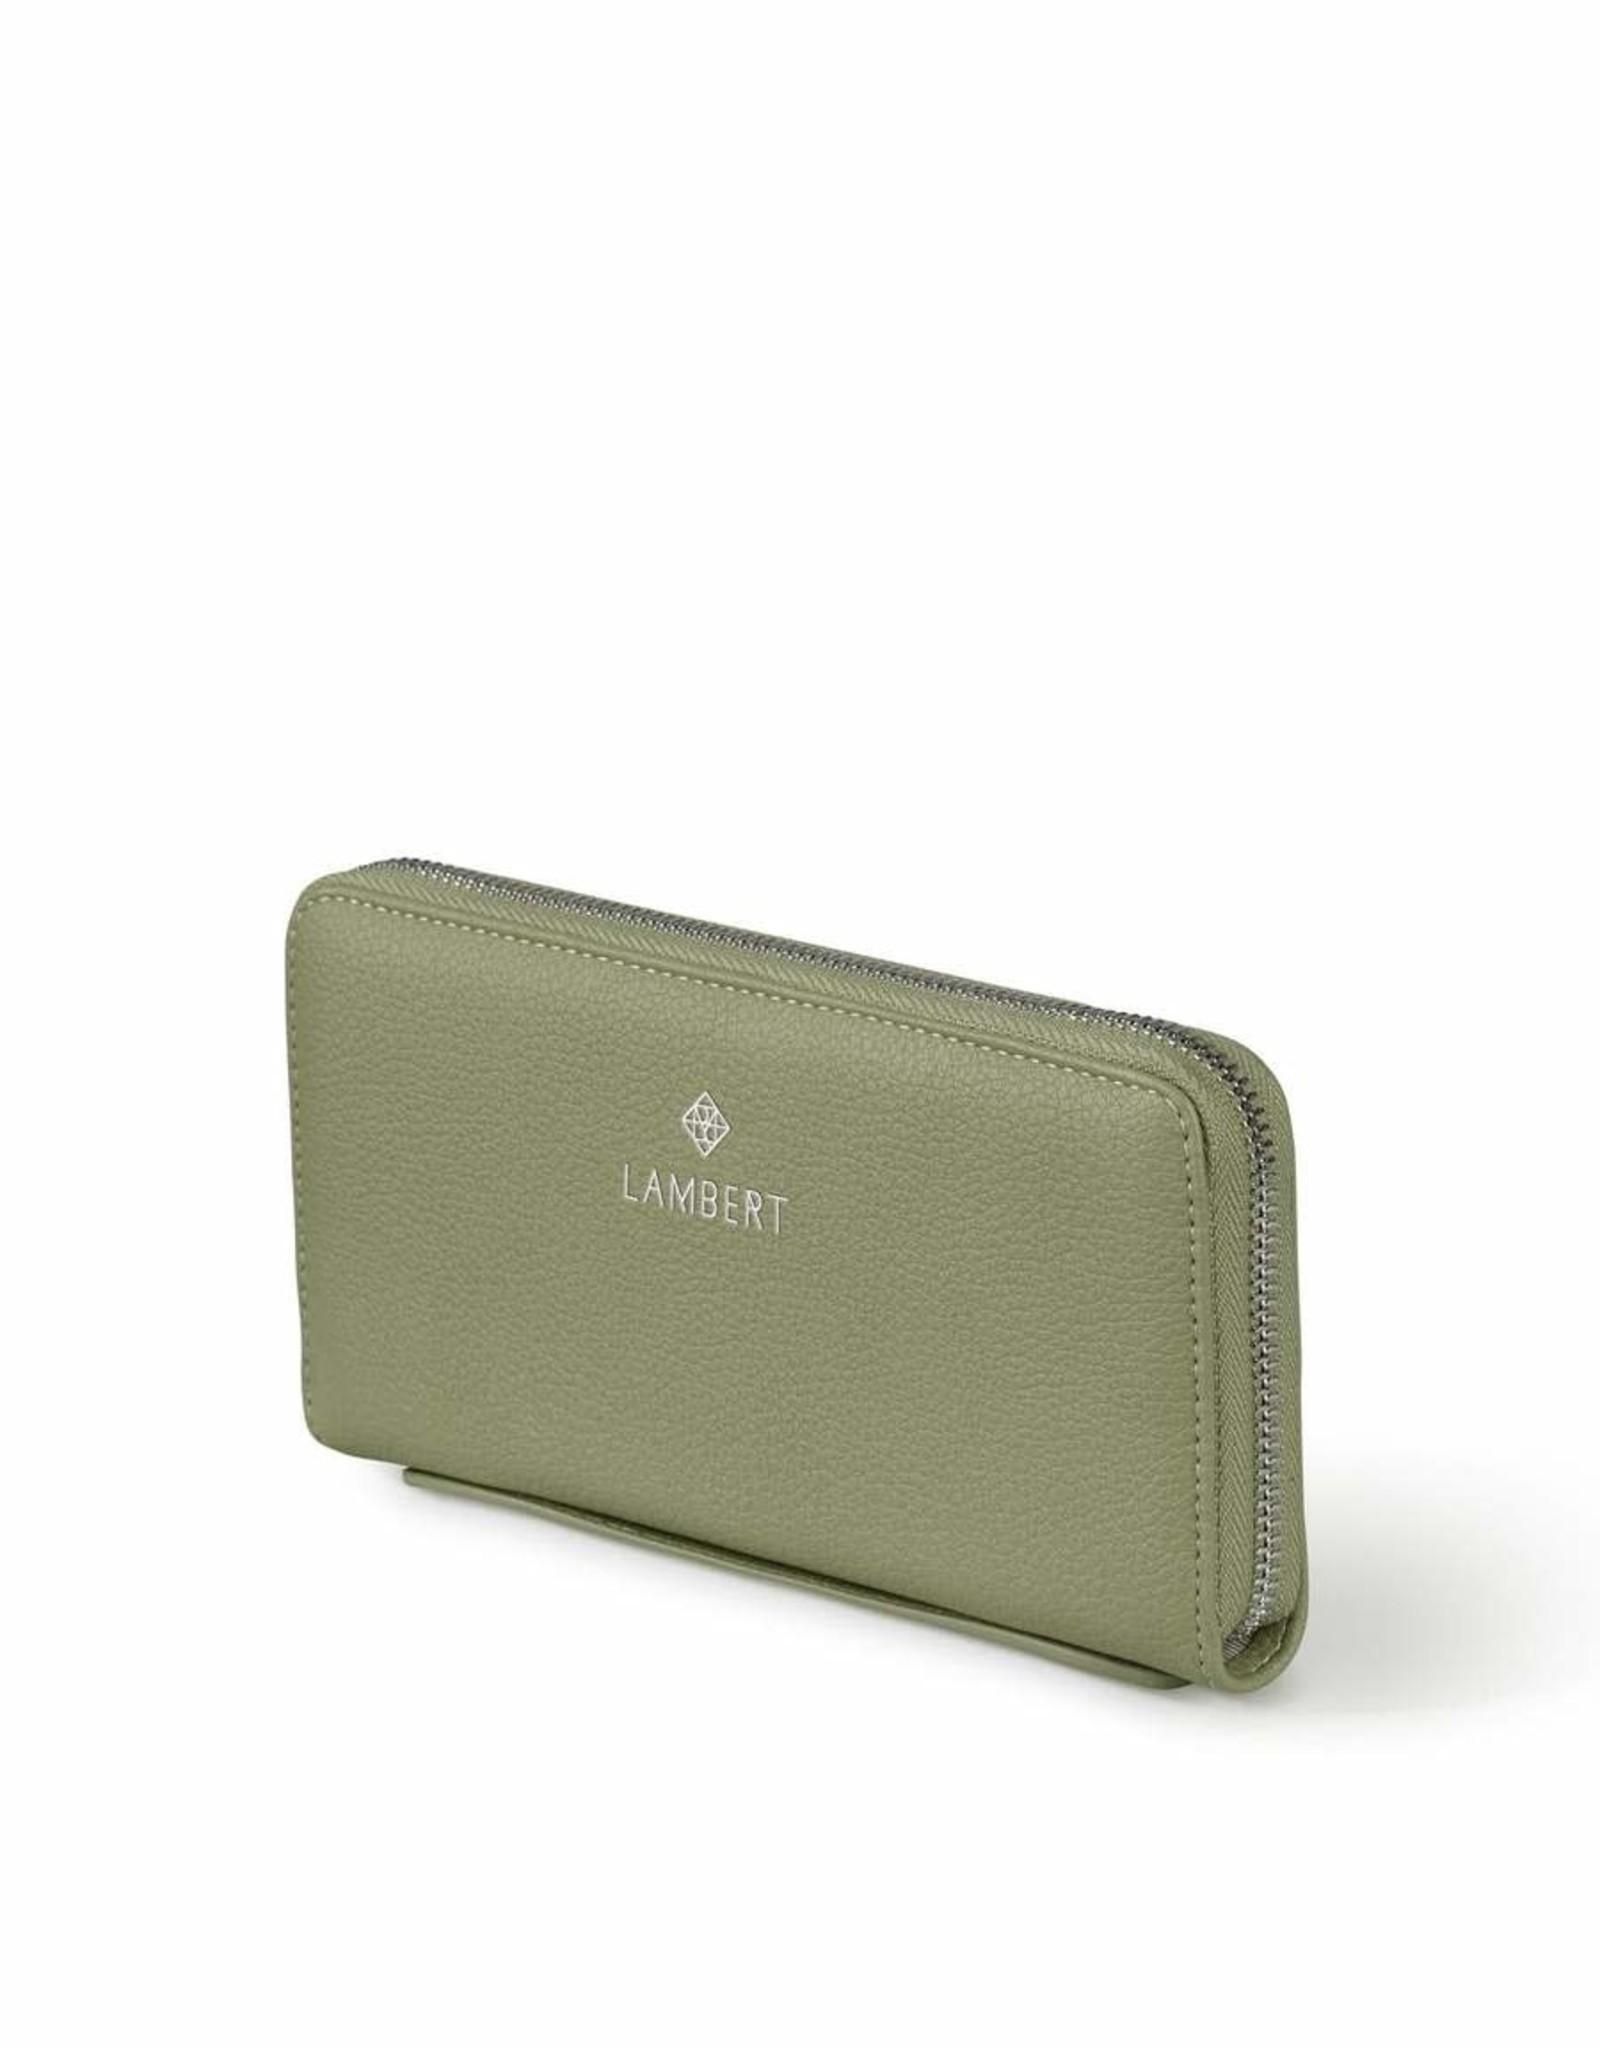 Lambert Portefeuille Meli - Sage